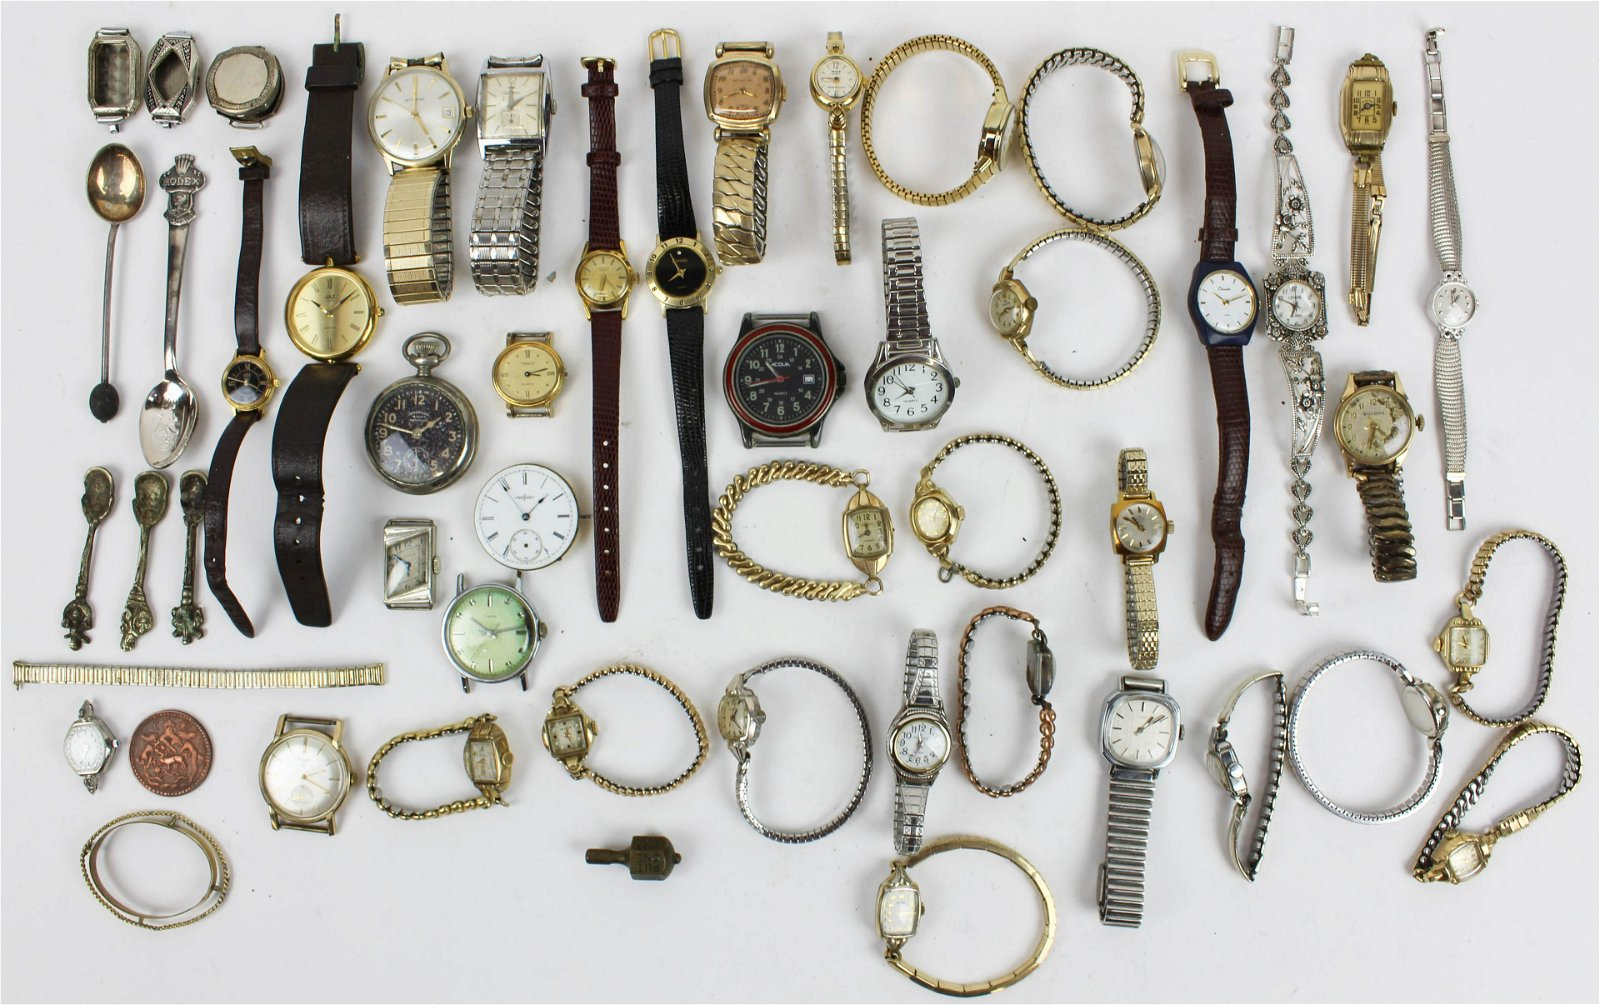 Group of Vintage men's & women's wrist watches